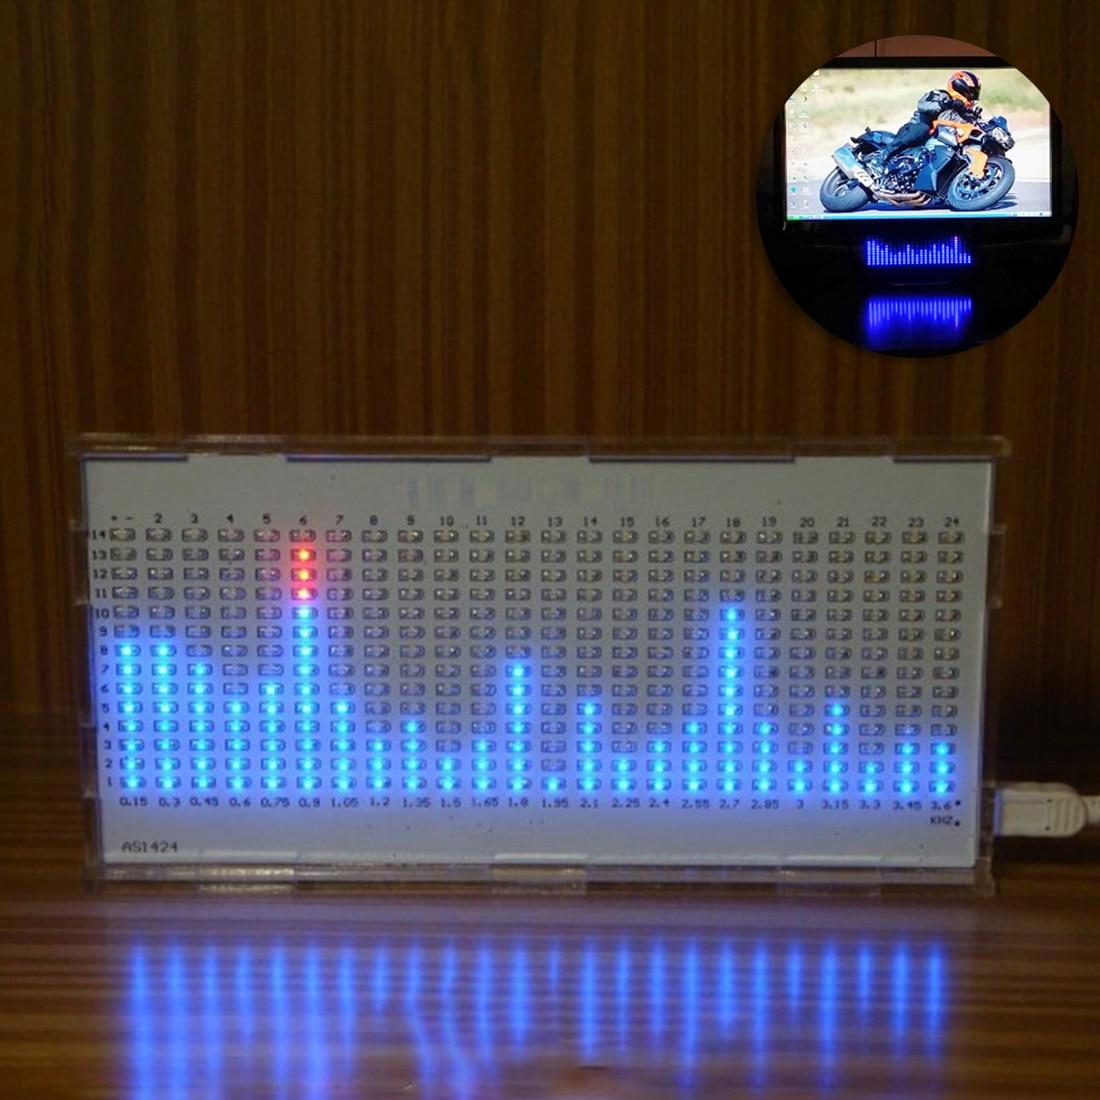 DIY Light Cube Kit AS1424 Music Spectrum LED Display Audio Amplifier Modification Rhythm Lamp - Bulk Parts White/ Black